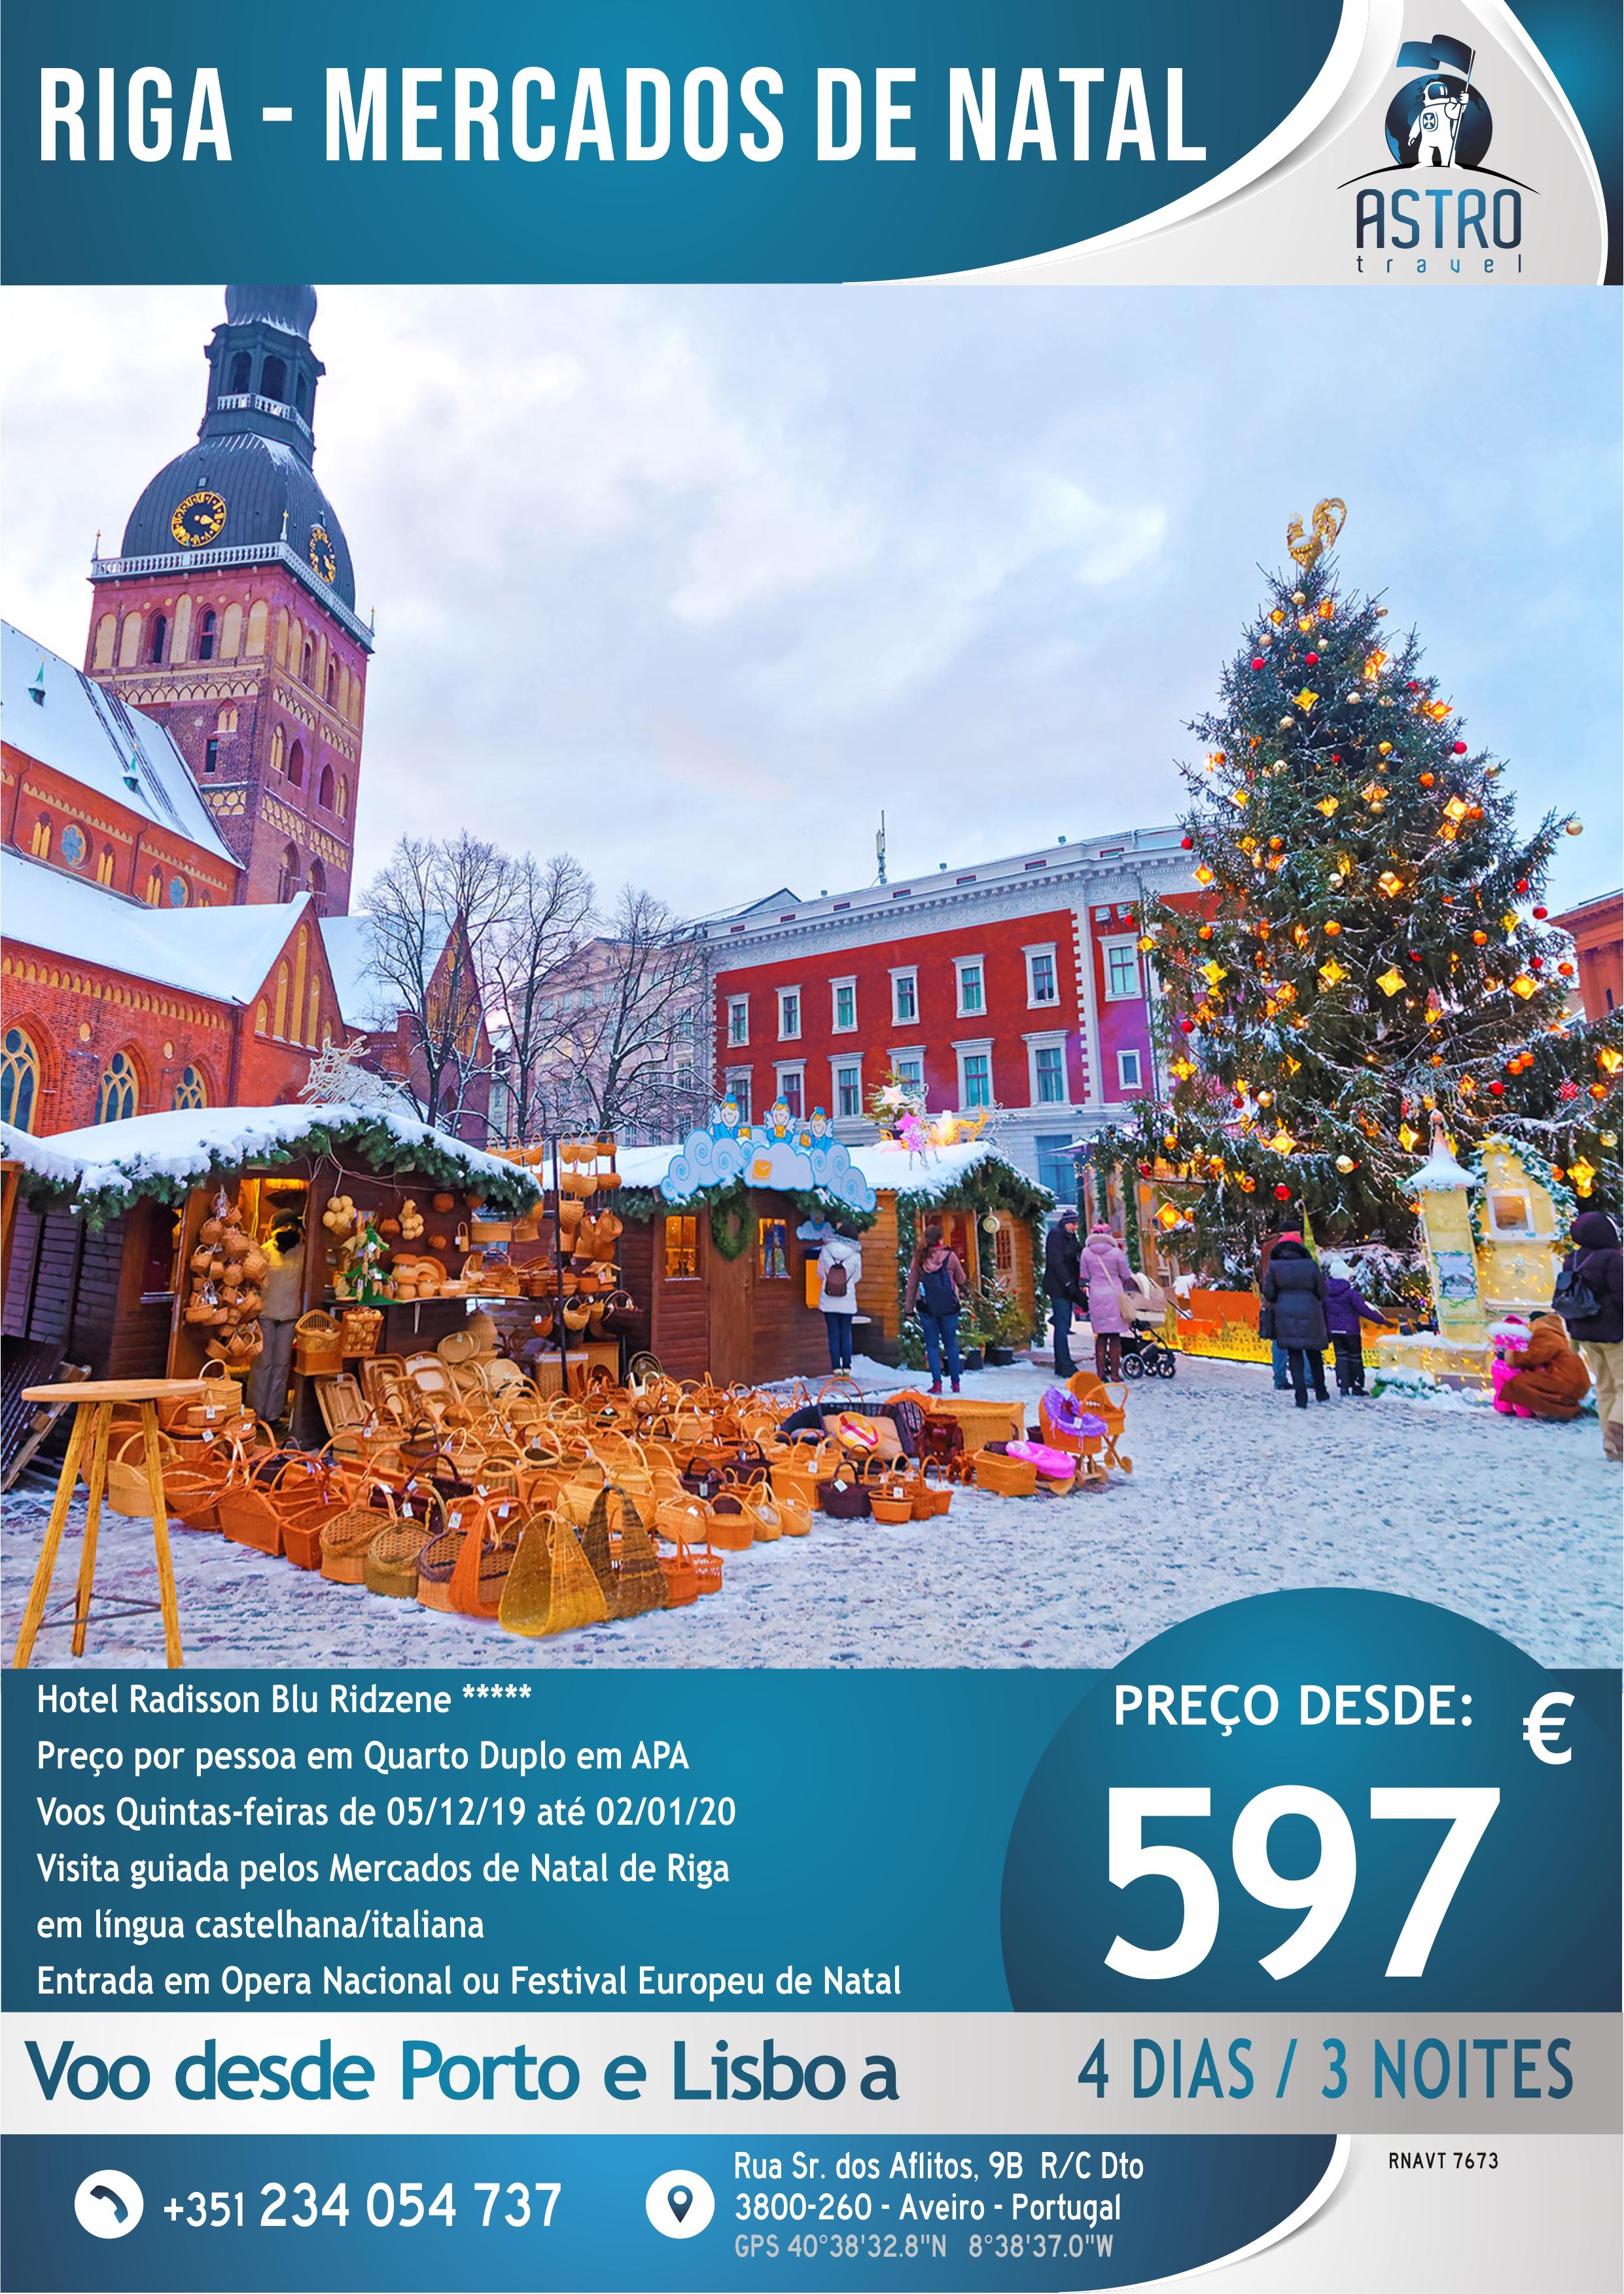 Riga mercados de natal 0